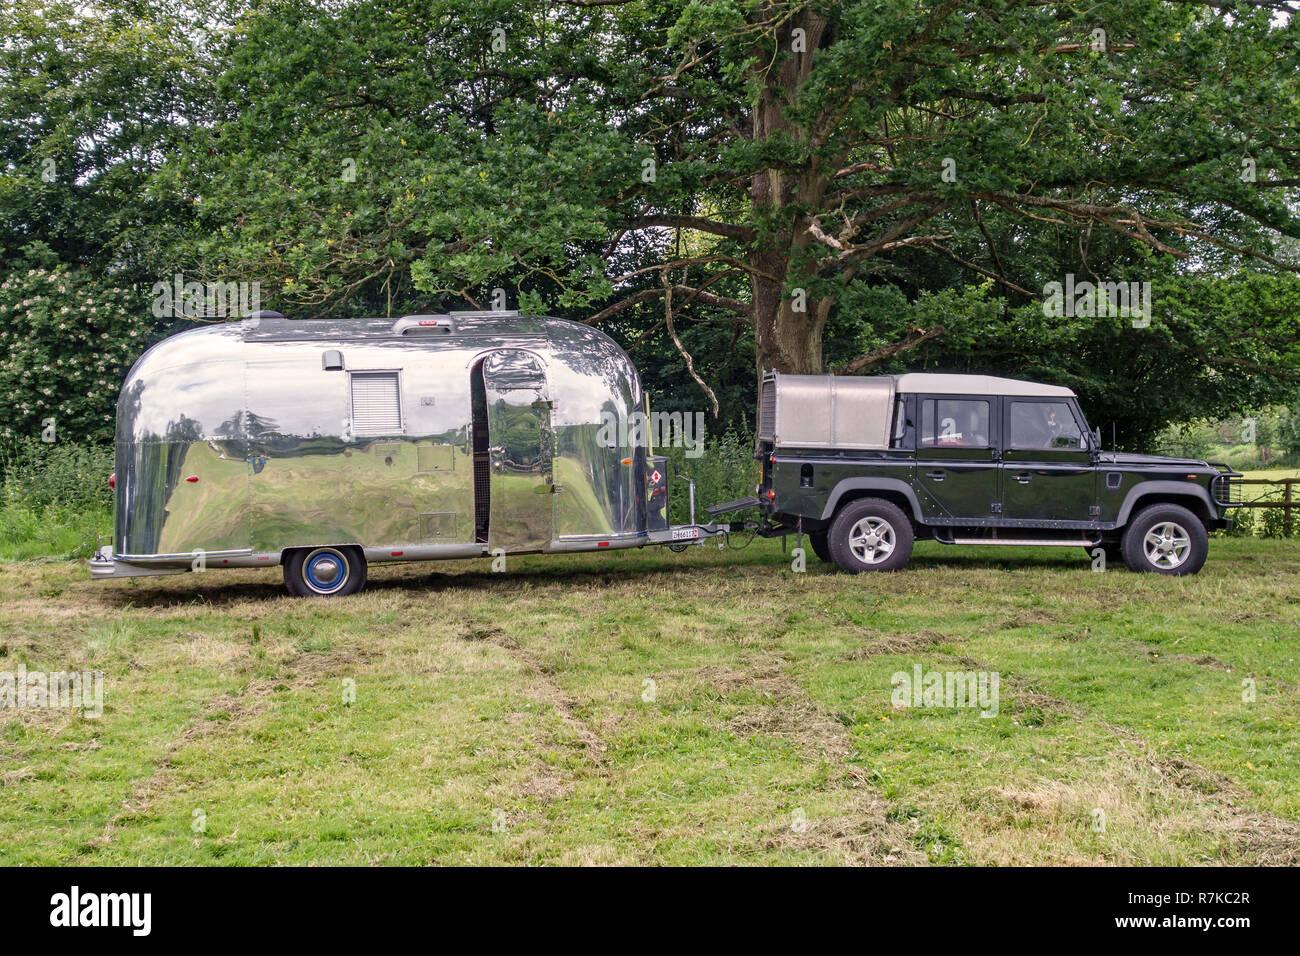 UK  Vintage Airstream caravan, towed by a Land Rover